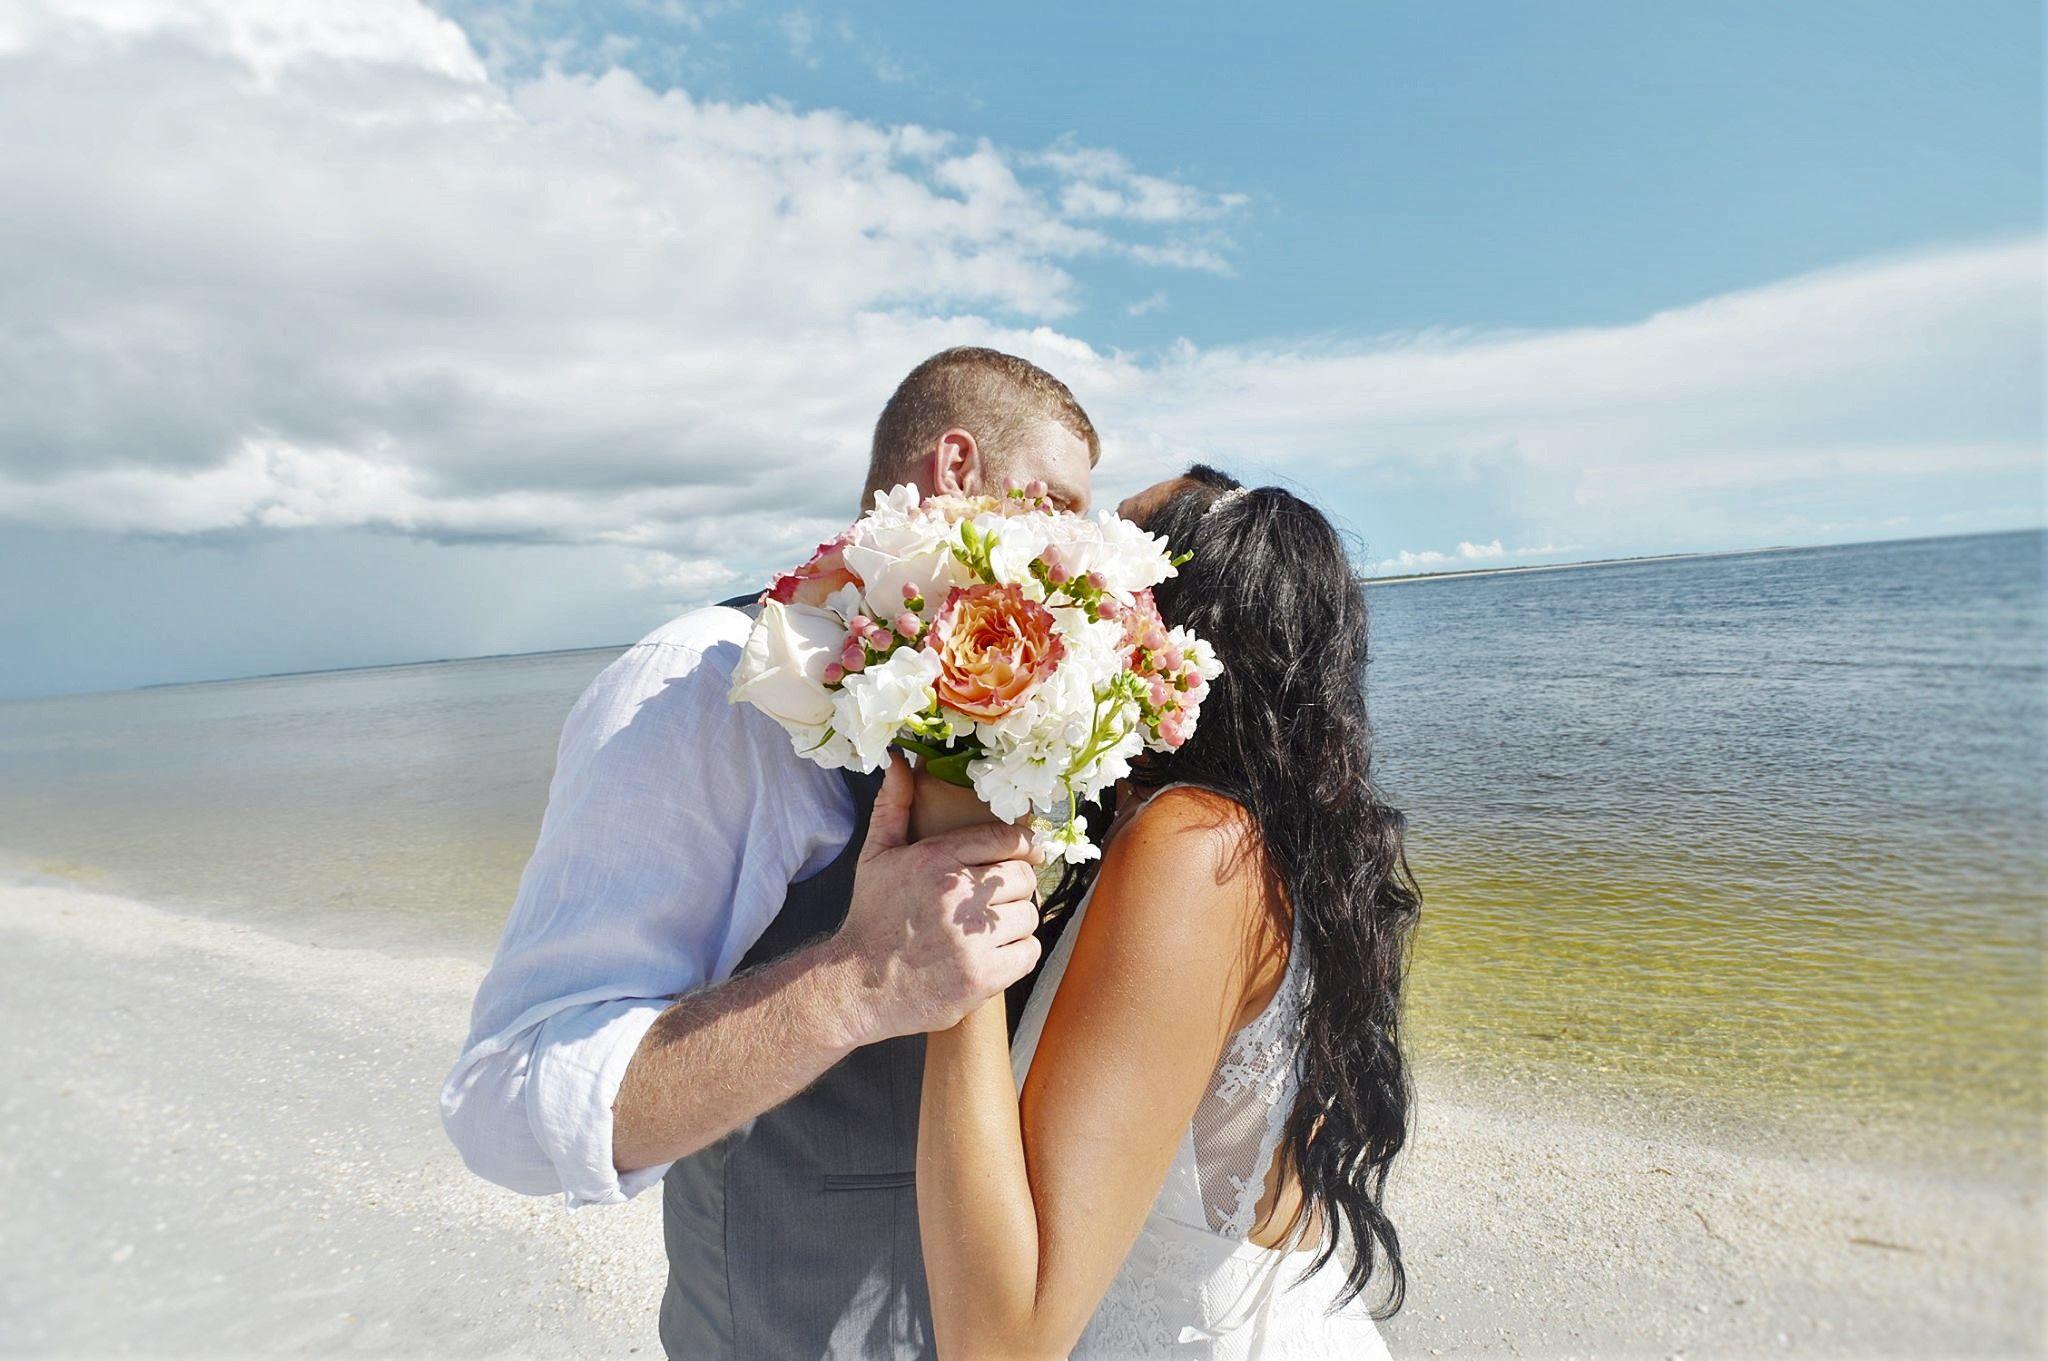 Long beach lighthouse wedding  Rustic beach wedding Florida lighthouse white sheers bamboo